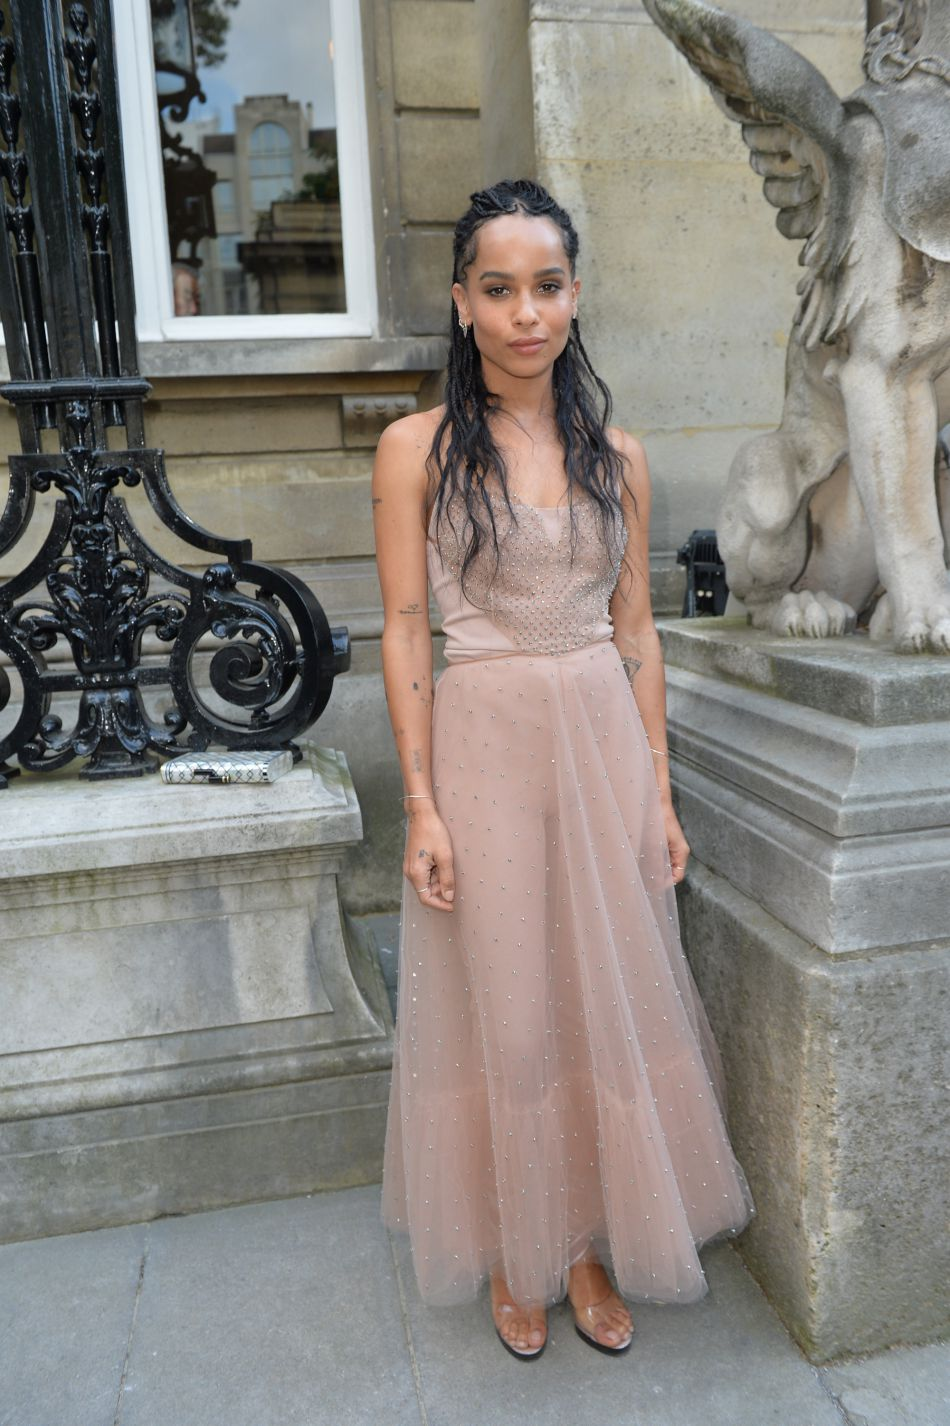 Zoé Kravitz porte une robe nude très chic chez Valentino.